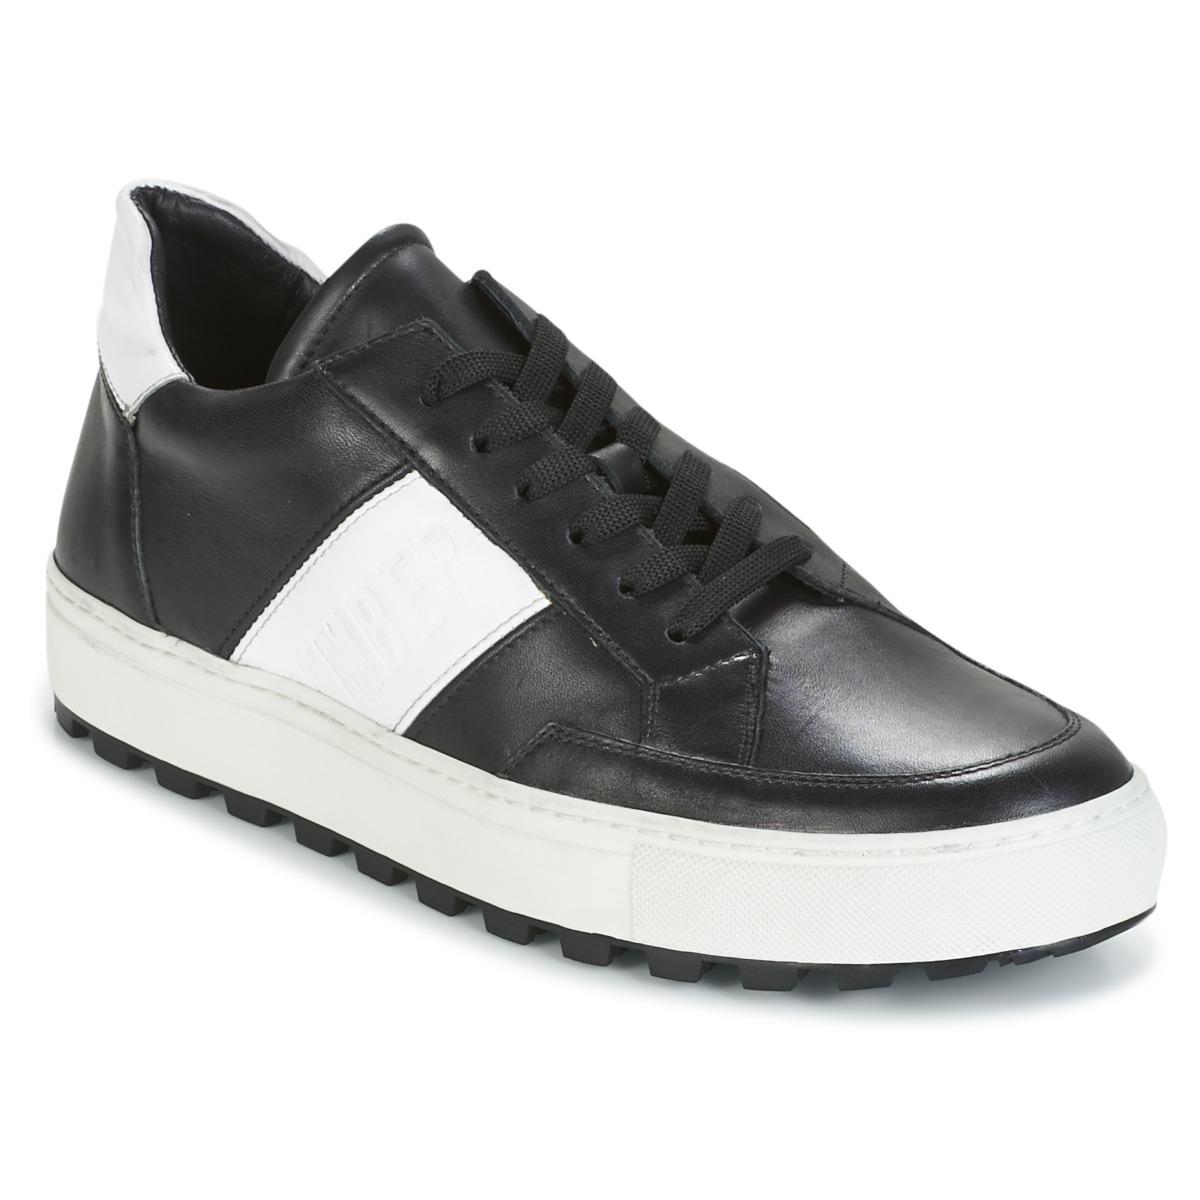 Sneakers Bikkembergs  TRACK-ER 966 LEATHER